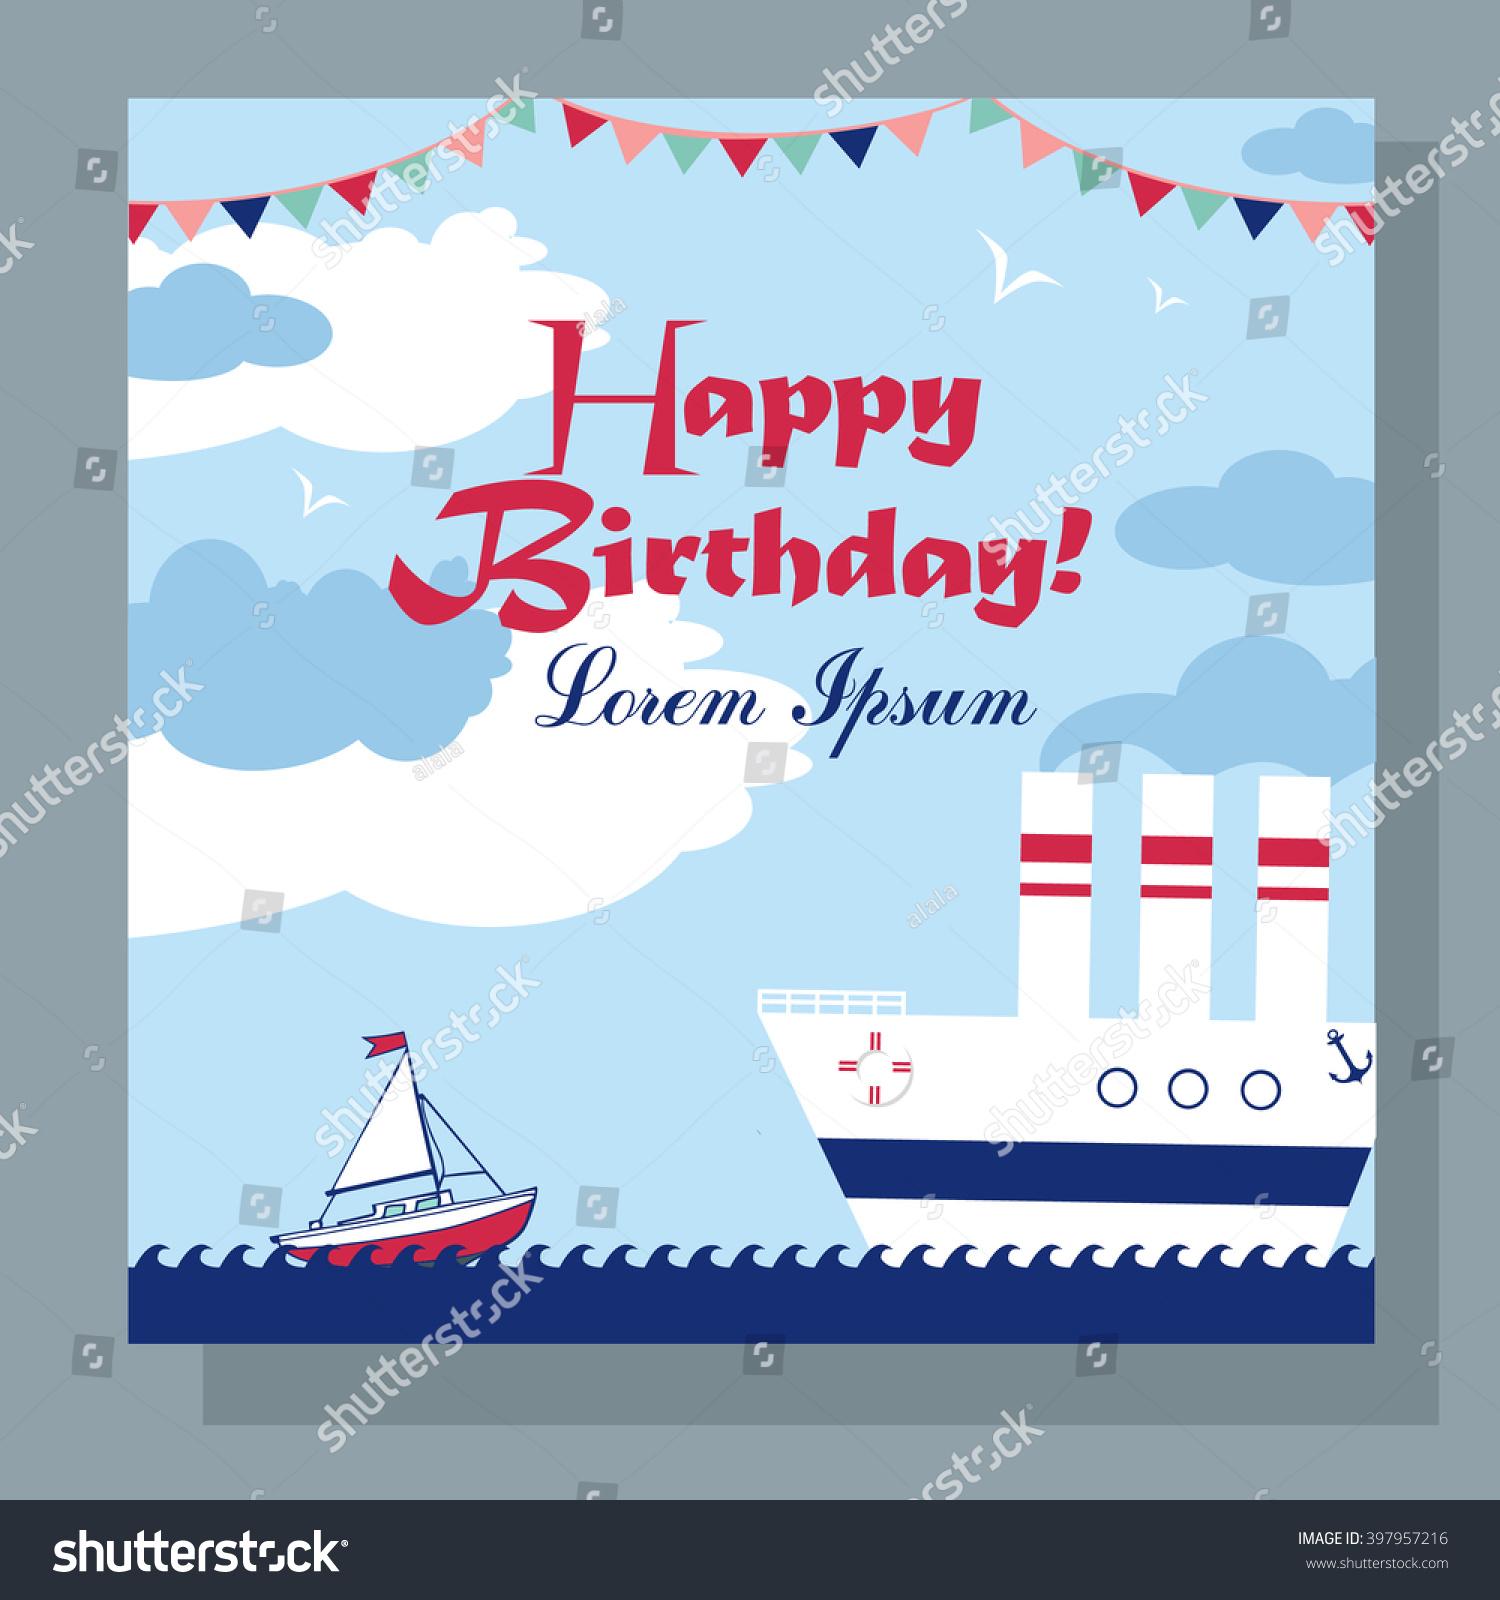 Happy Birthday Card Two Boats Sea Stock Vector (Royalty Free